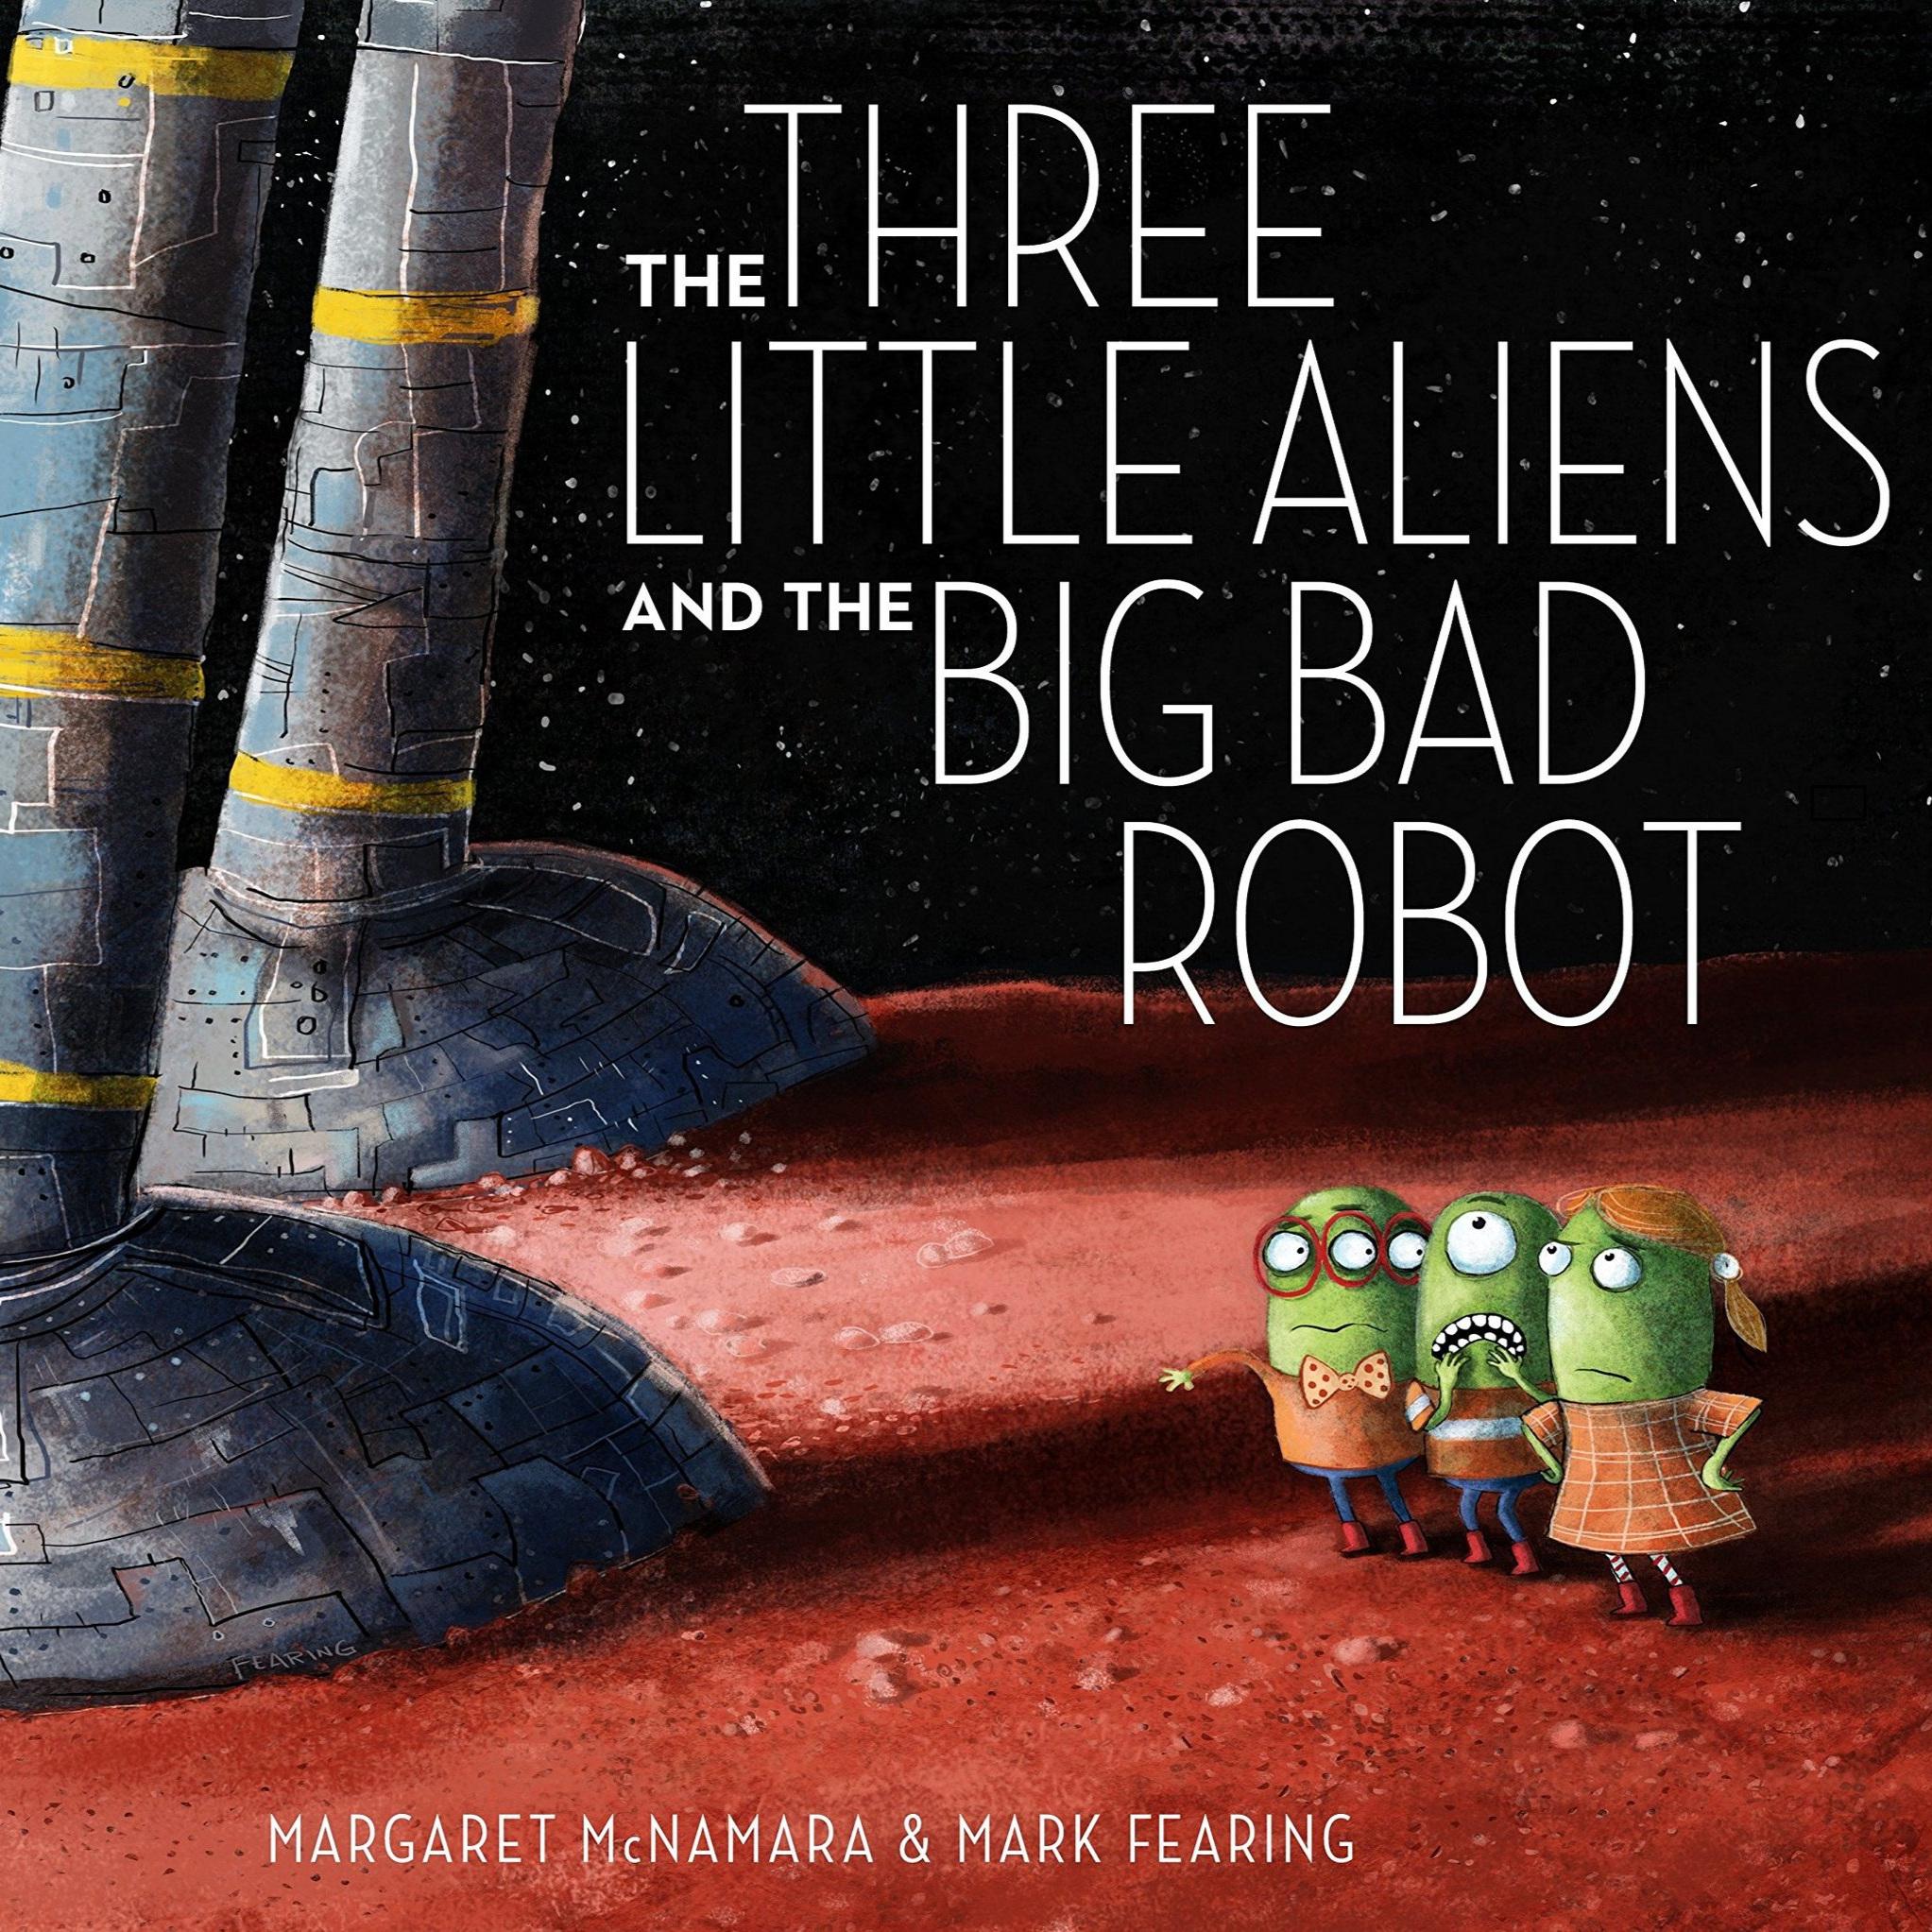 Three+little+aliens.jpg